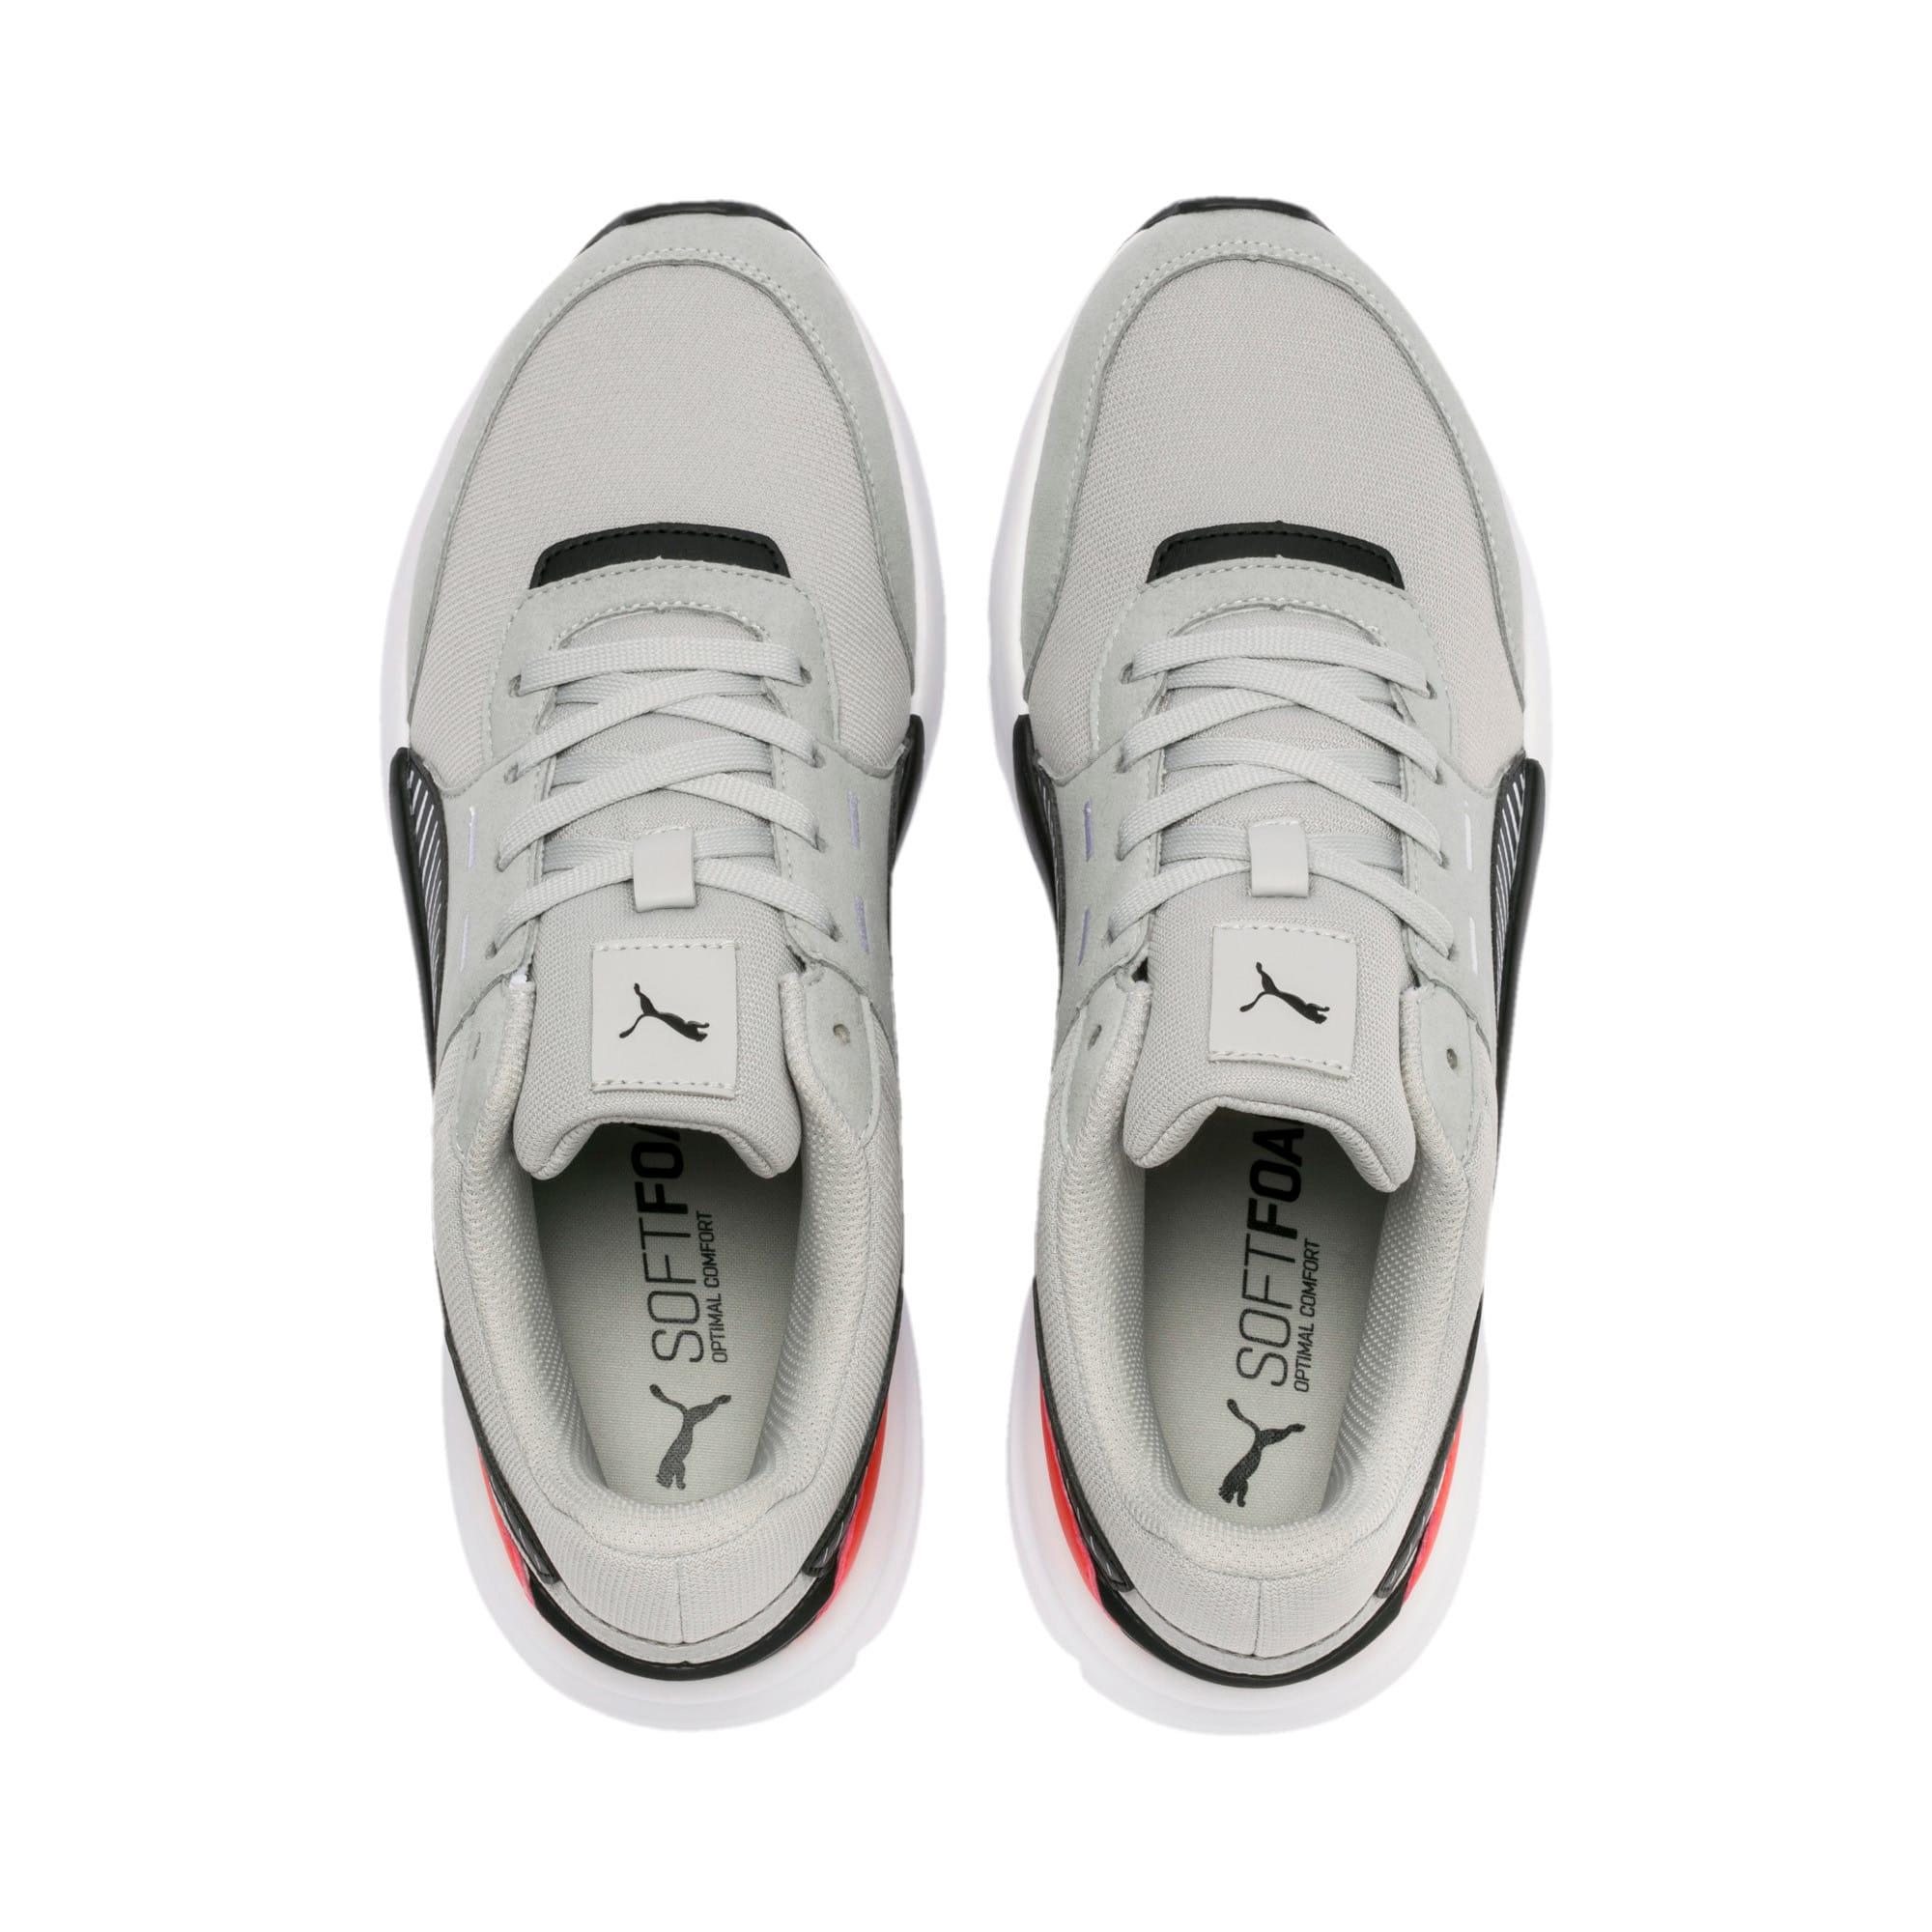 Thumbnail 4 of Future Runner Running Shoes, High Rise-Black-C Tomato-Wht, medium-IND